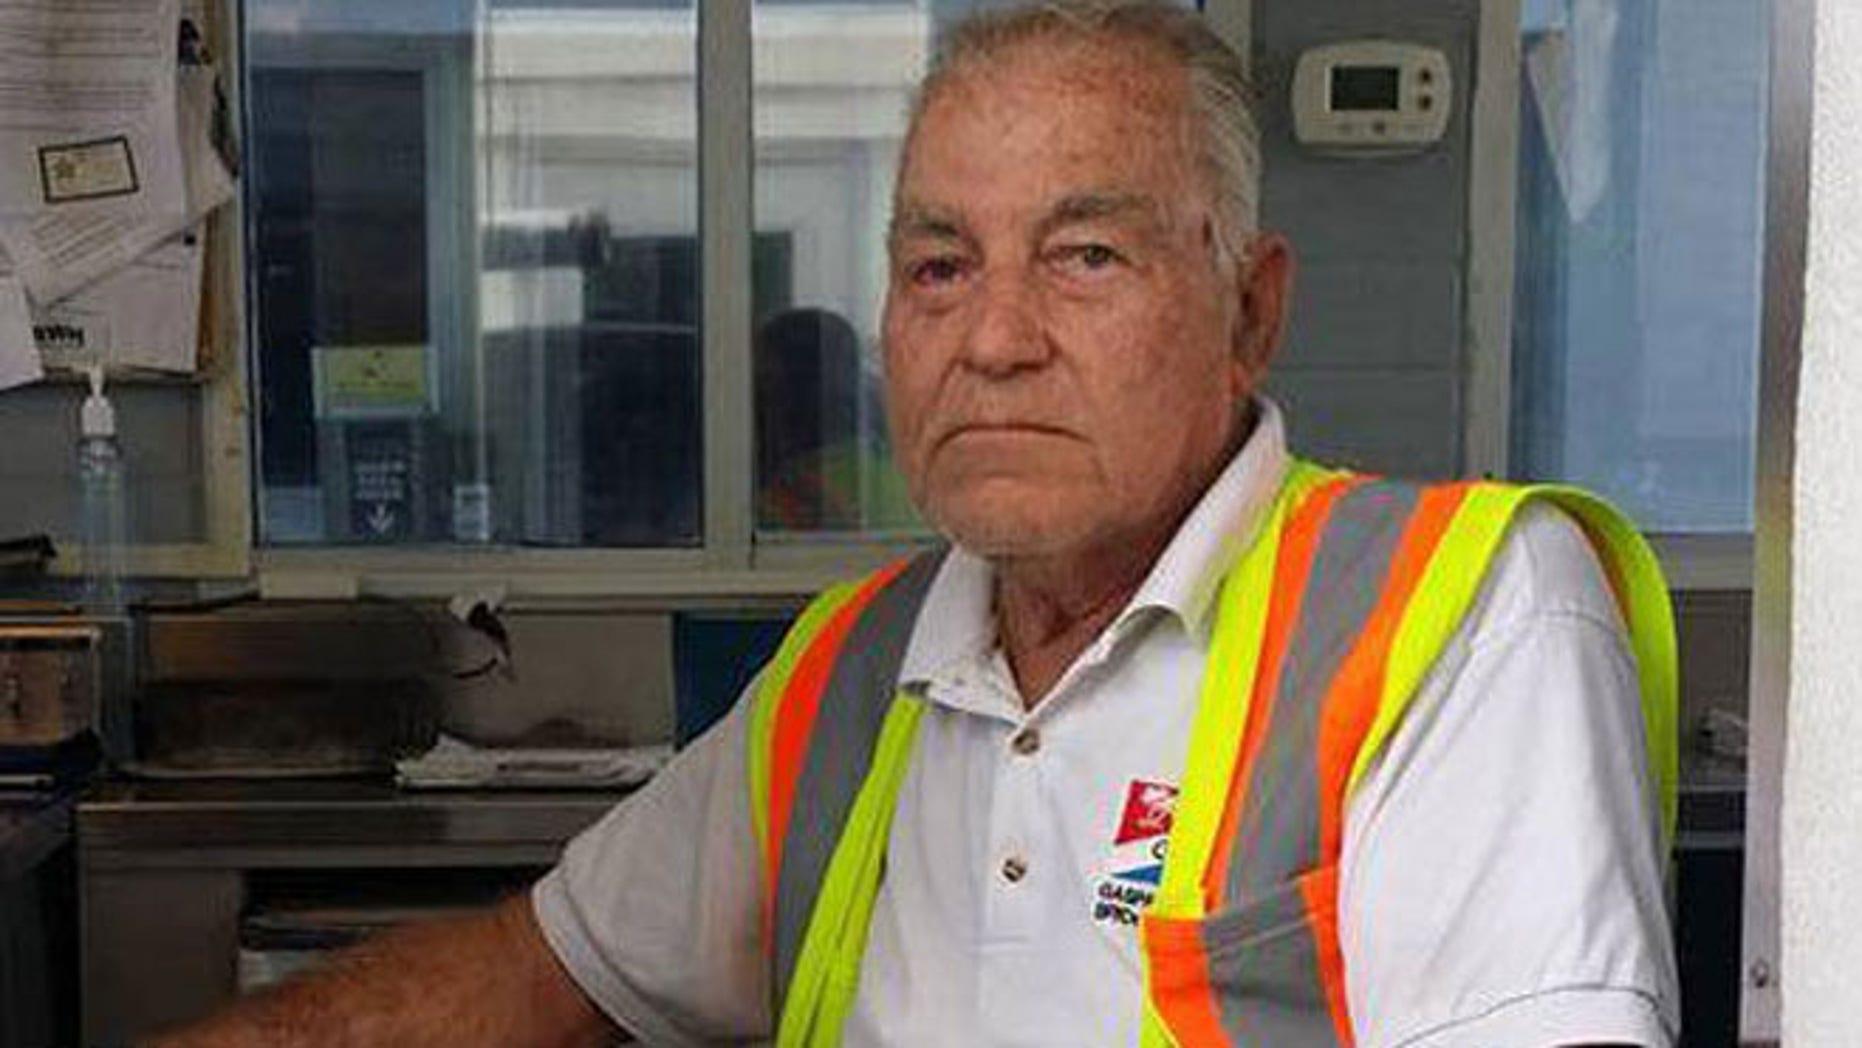 Vladislav Samsonov was fired for paying a customer's $5 toll.